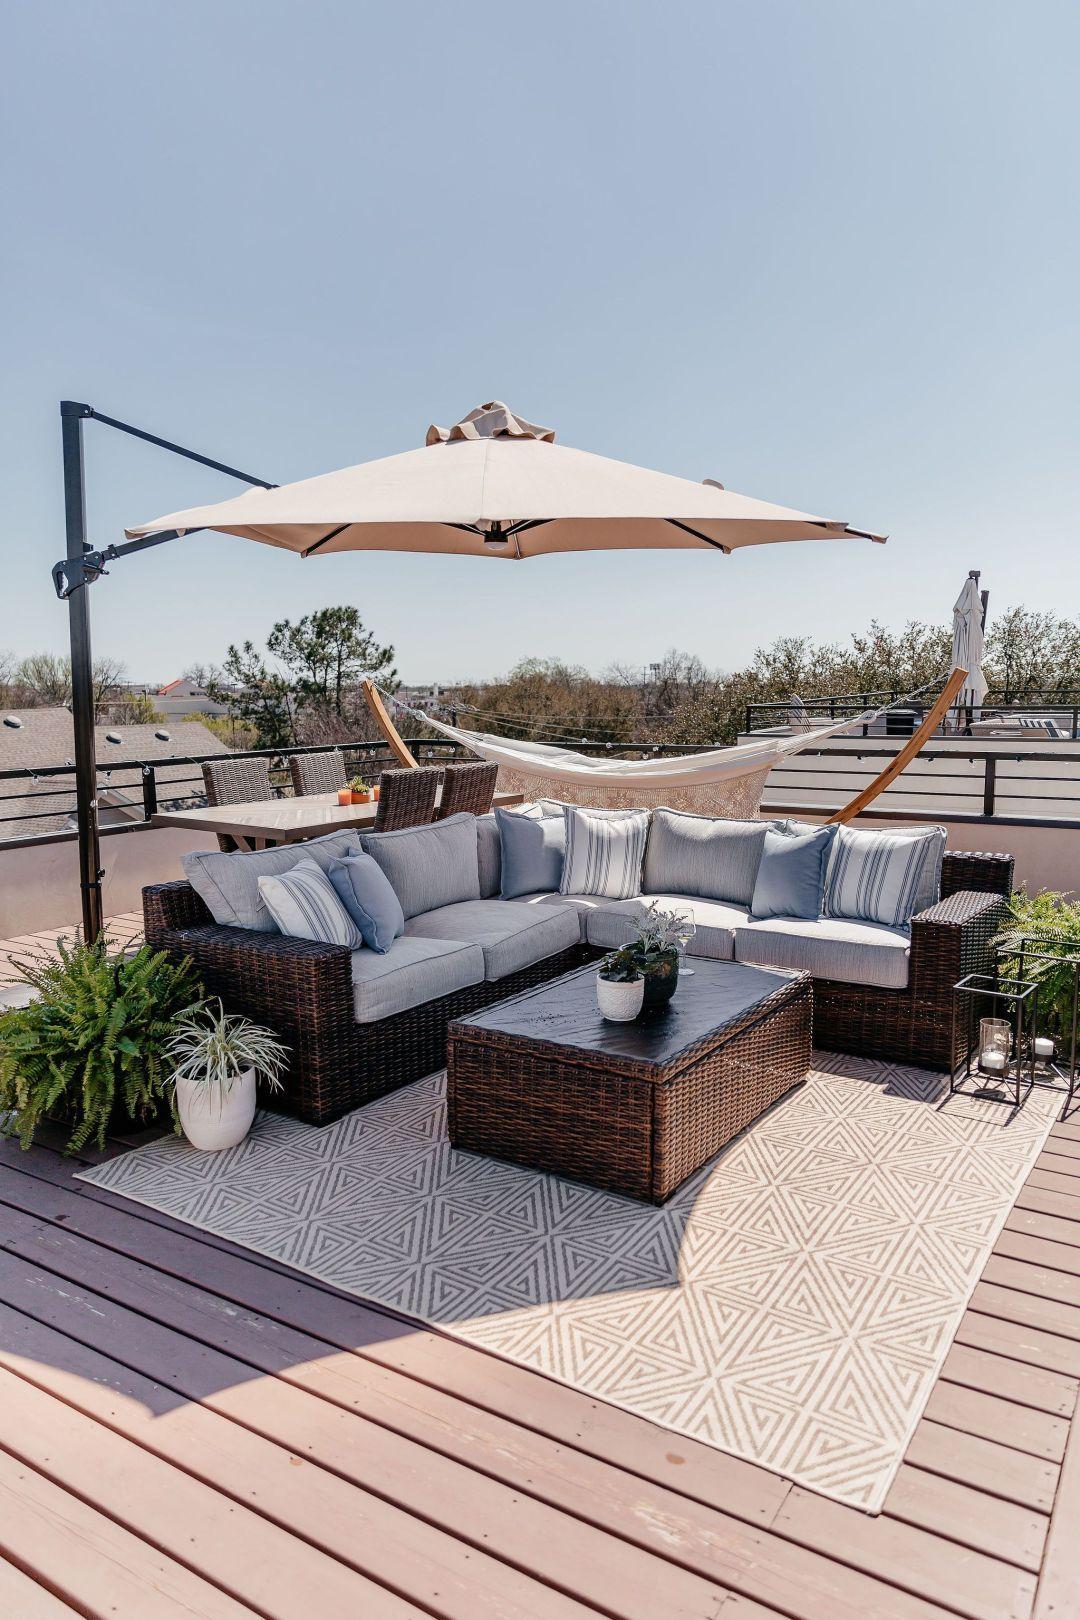 Photo of Our New Rooftop Patio! | Dani Austin | Dallas Fashion Blogger